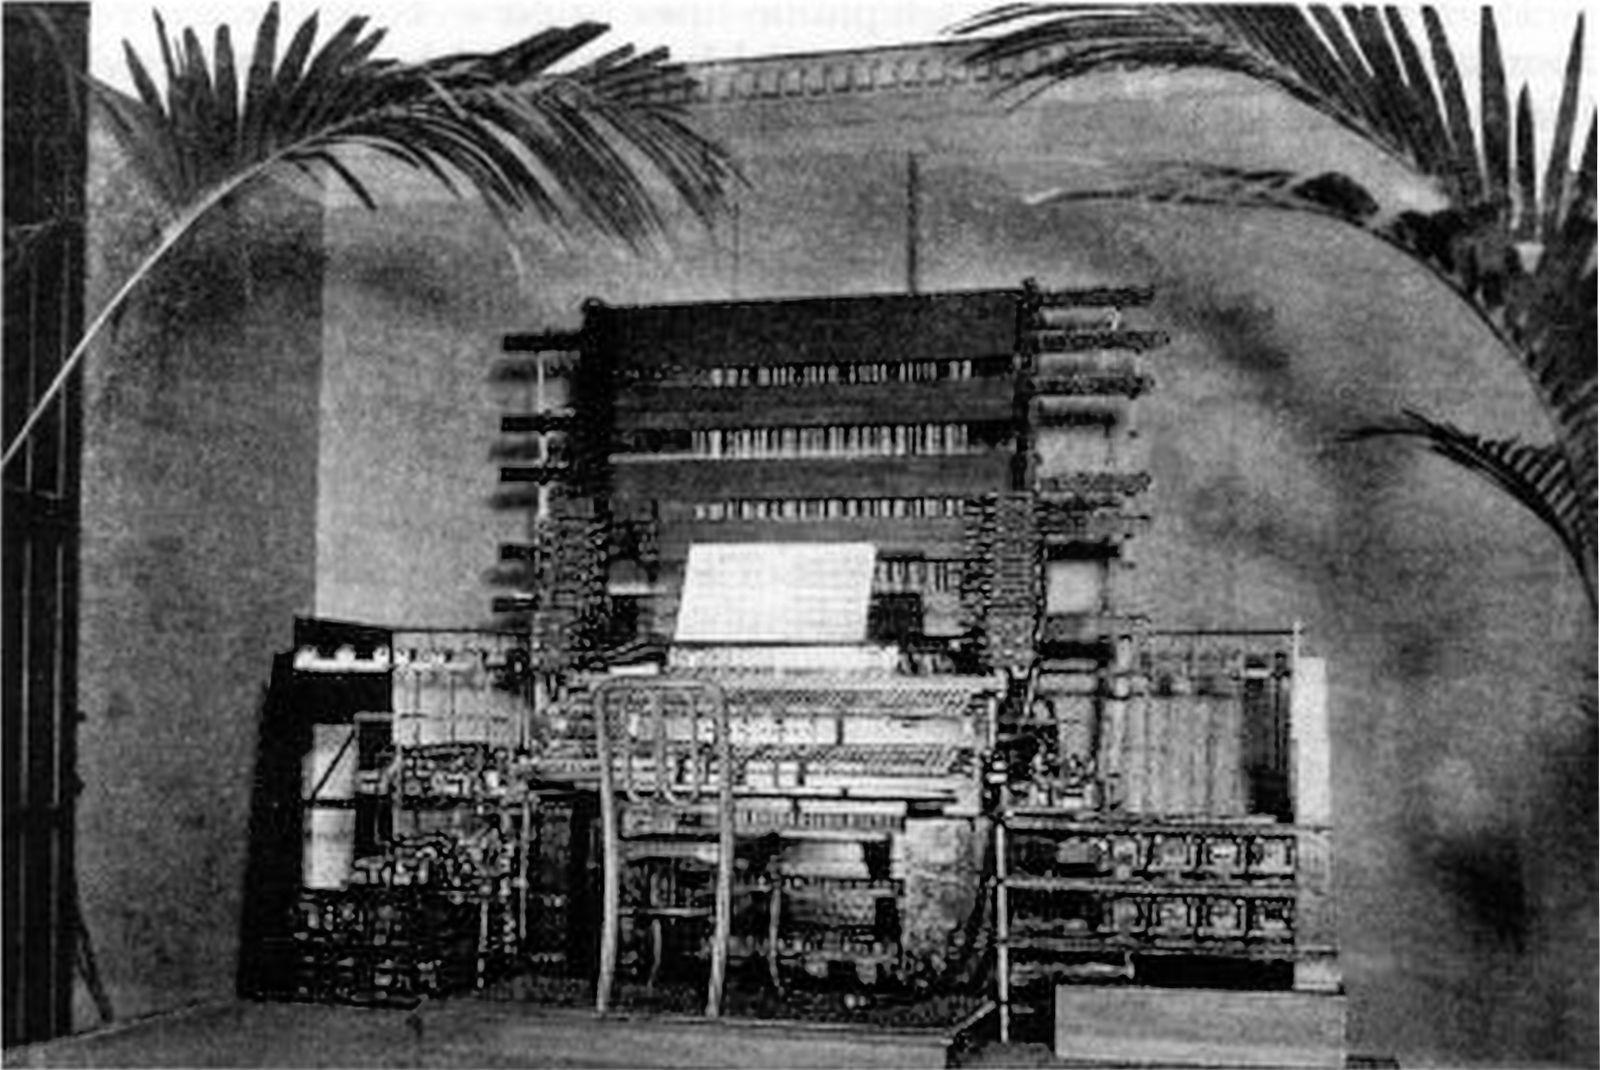 Das Telharmonium, Wikipedia